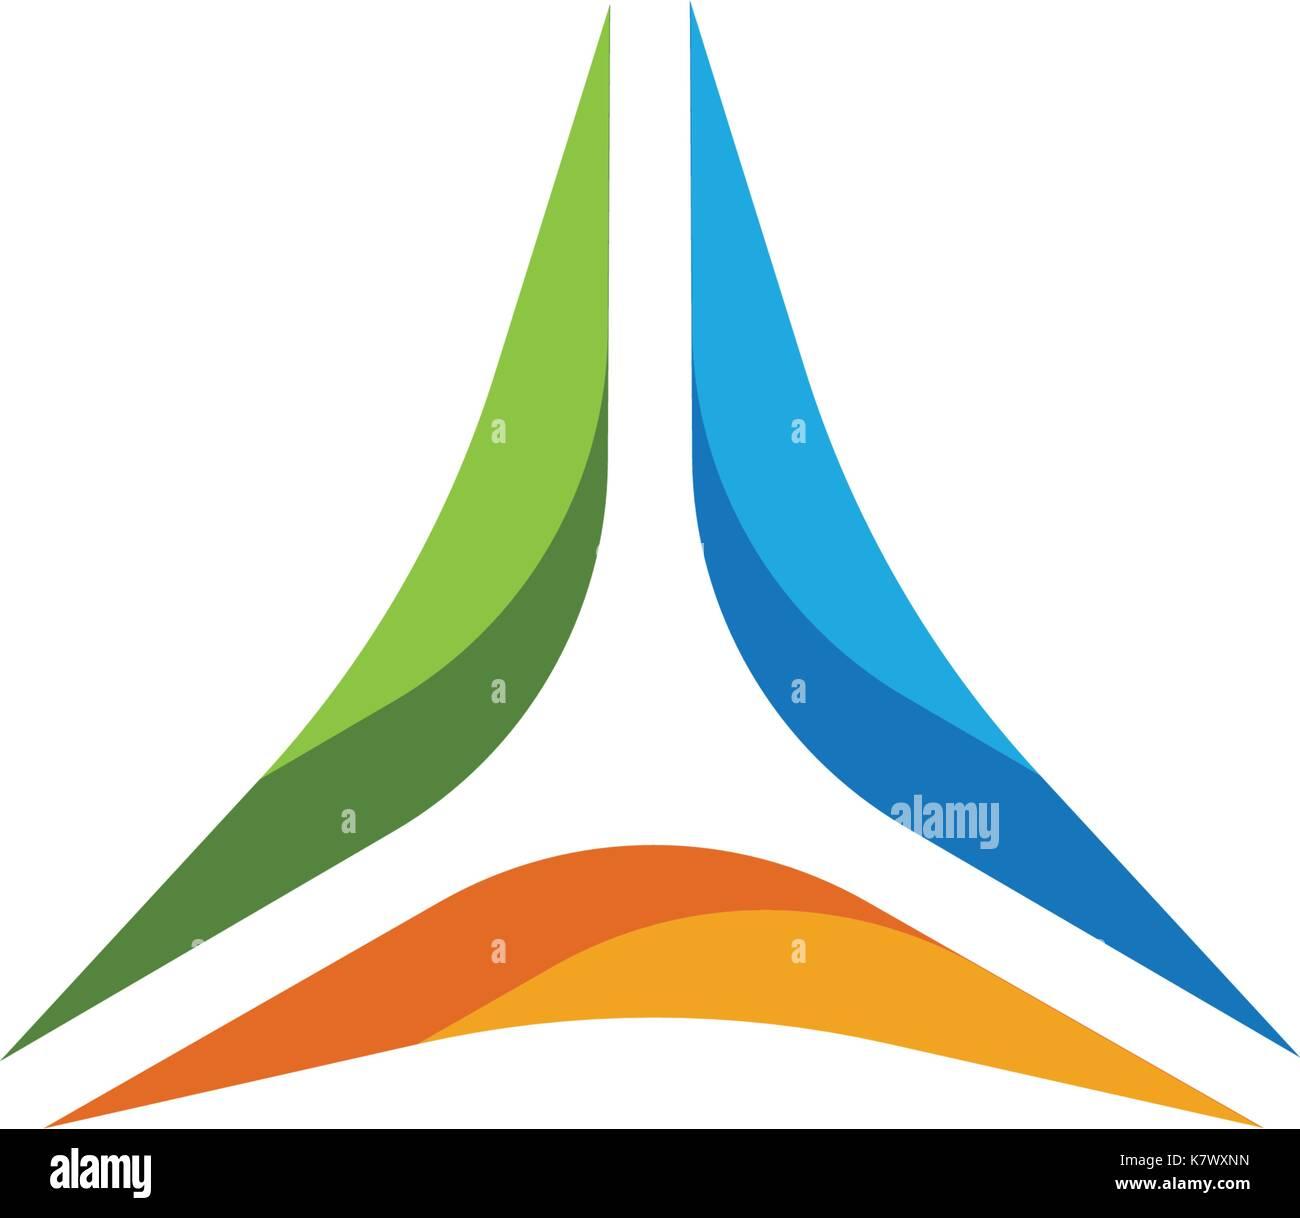 Triangle Logo Template vector icon illustration design - Stock Vector